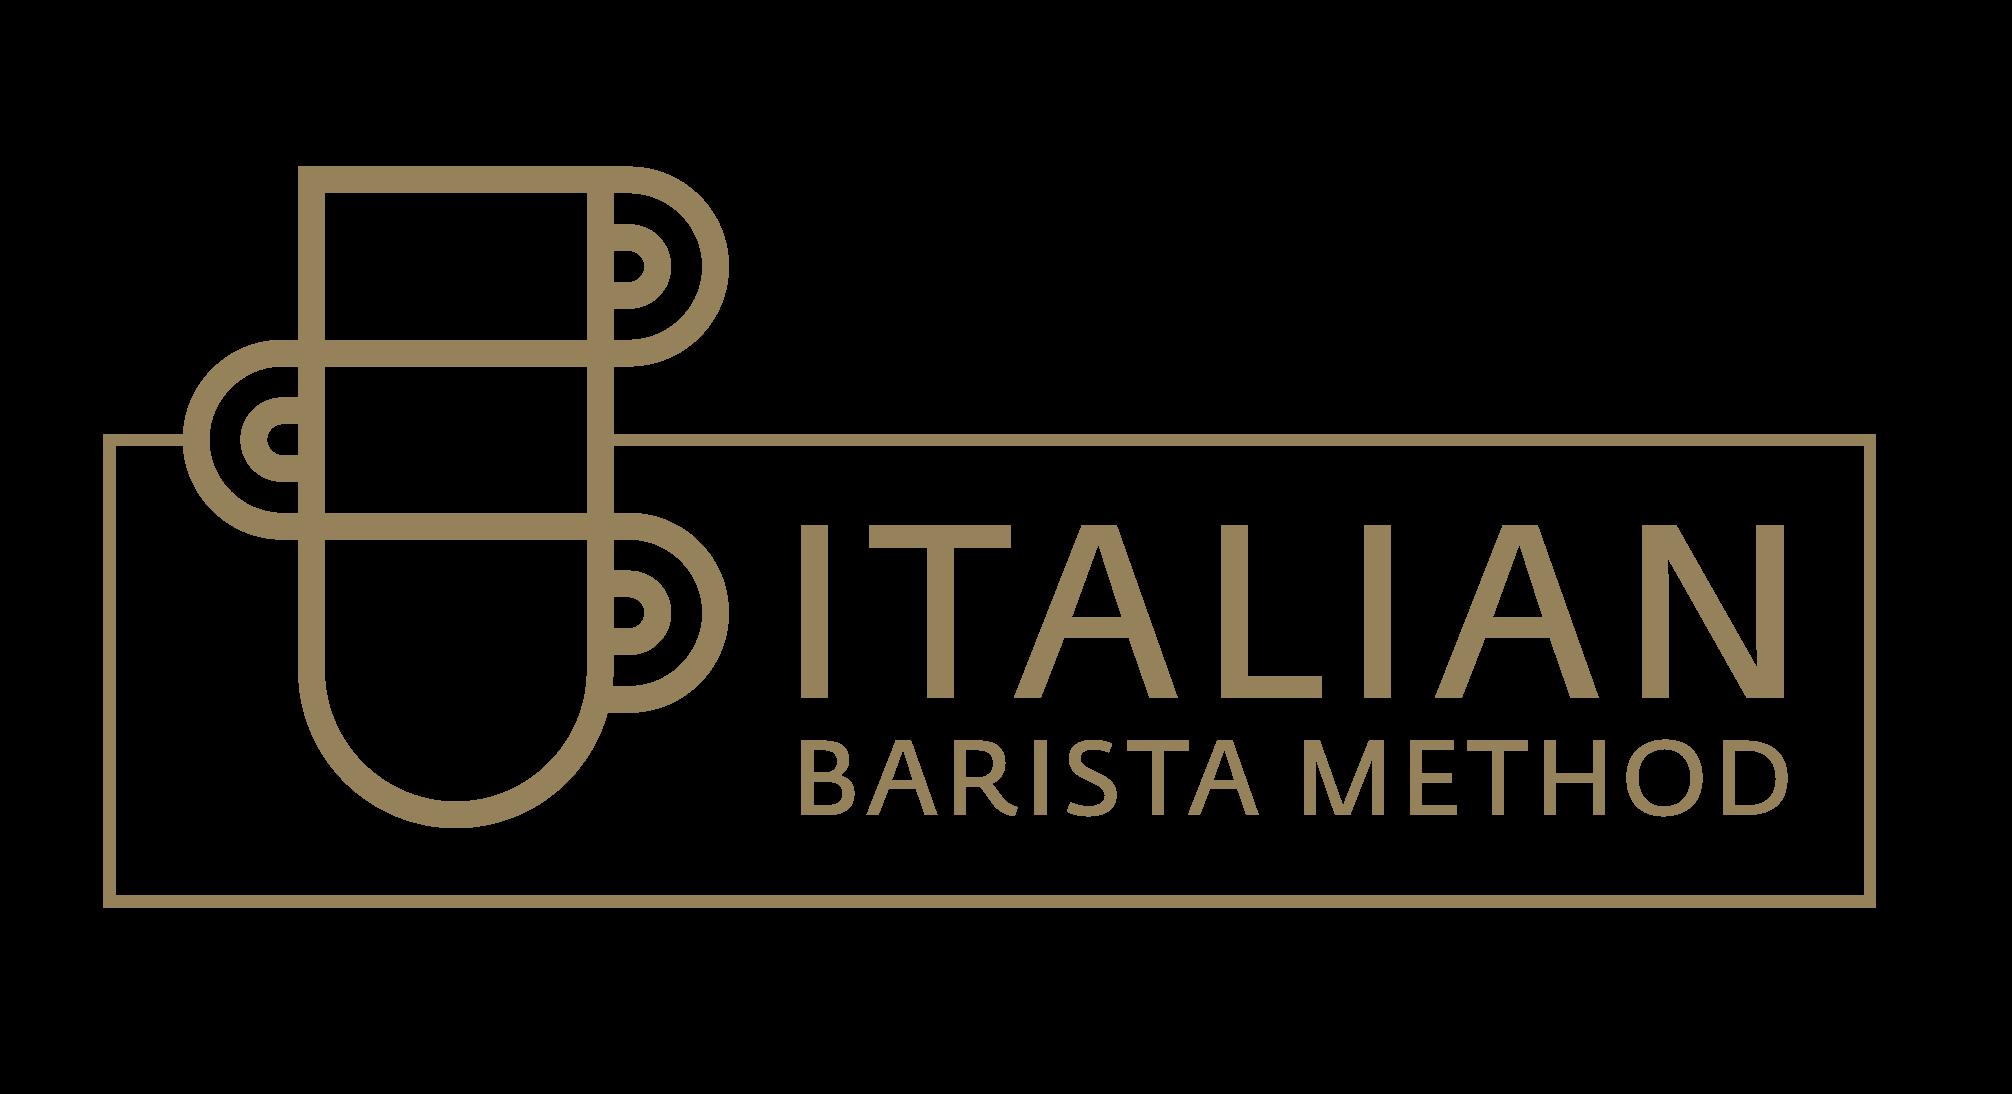 Italian Barista Method Certifications